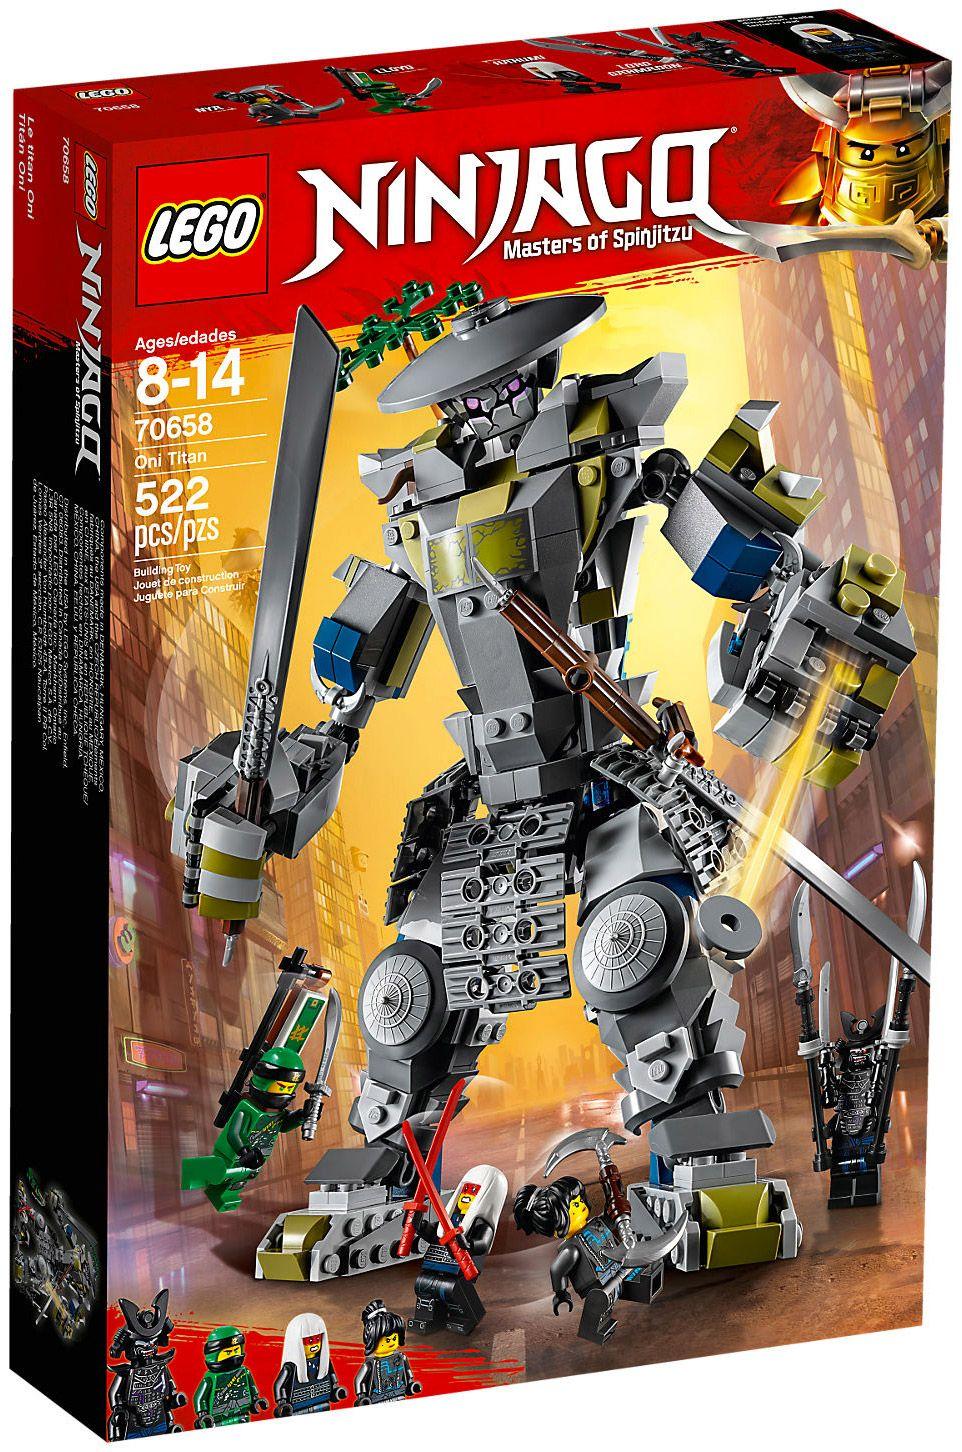 Lego ninjago 70658 pas cher oni titan - Photo lego ninjago ...